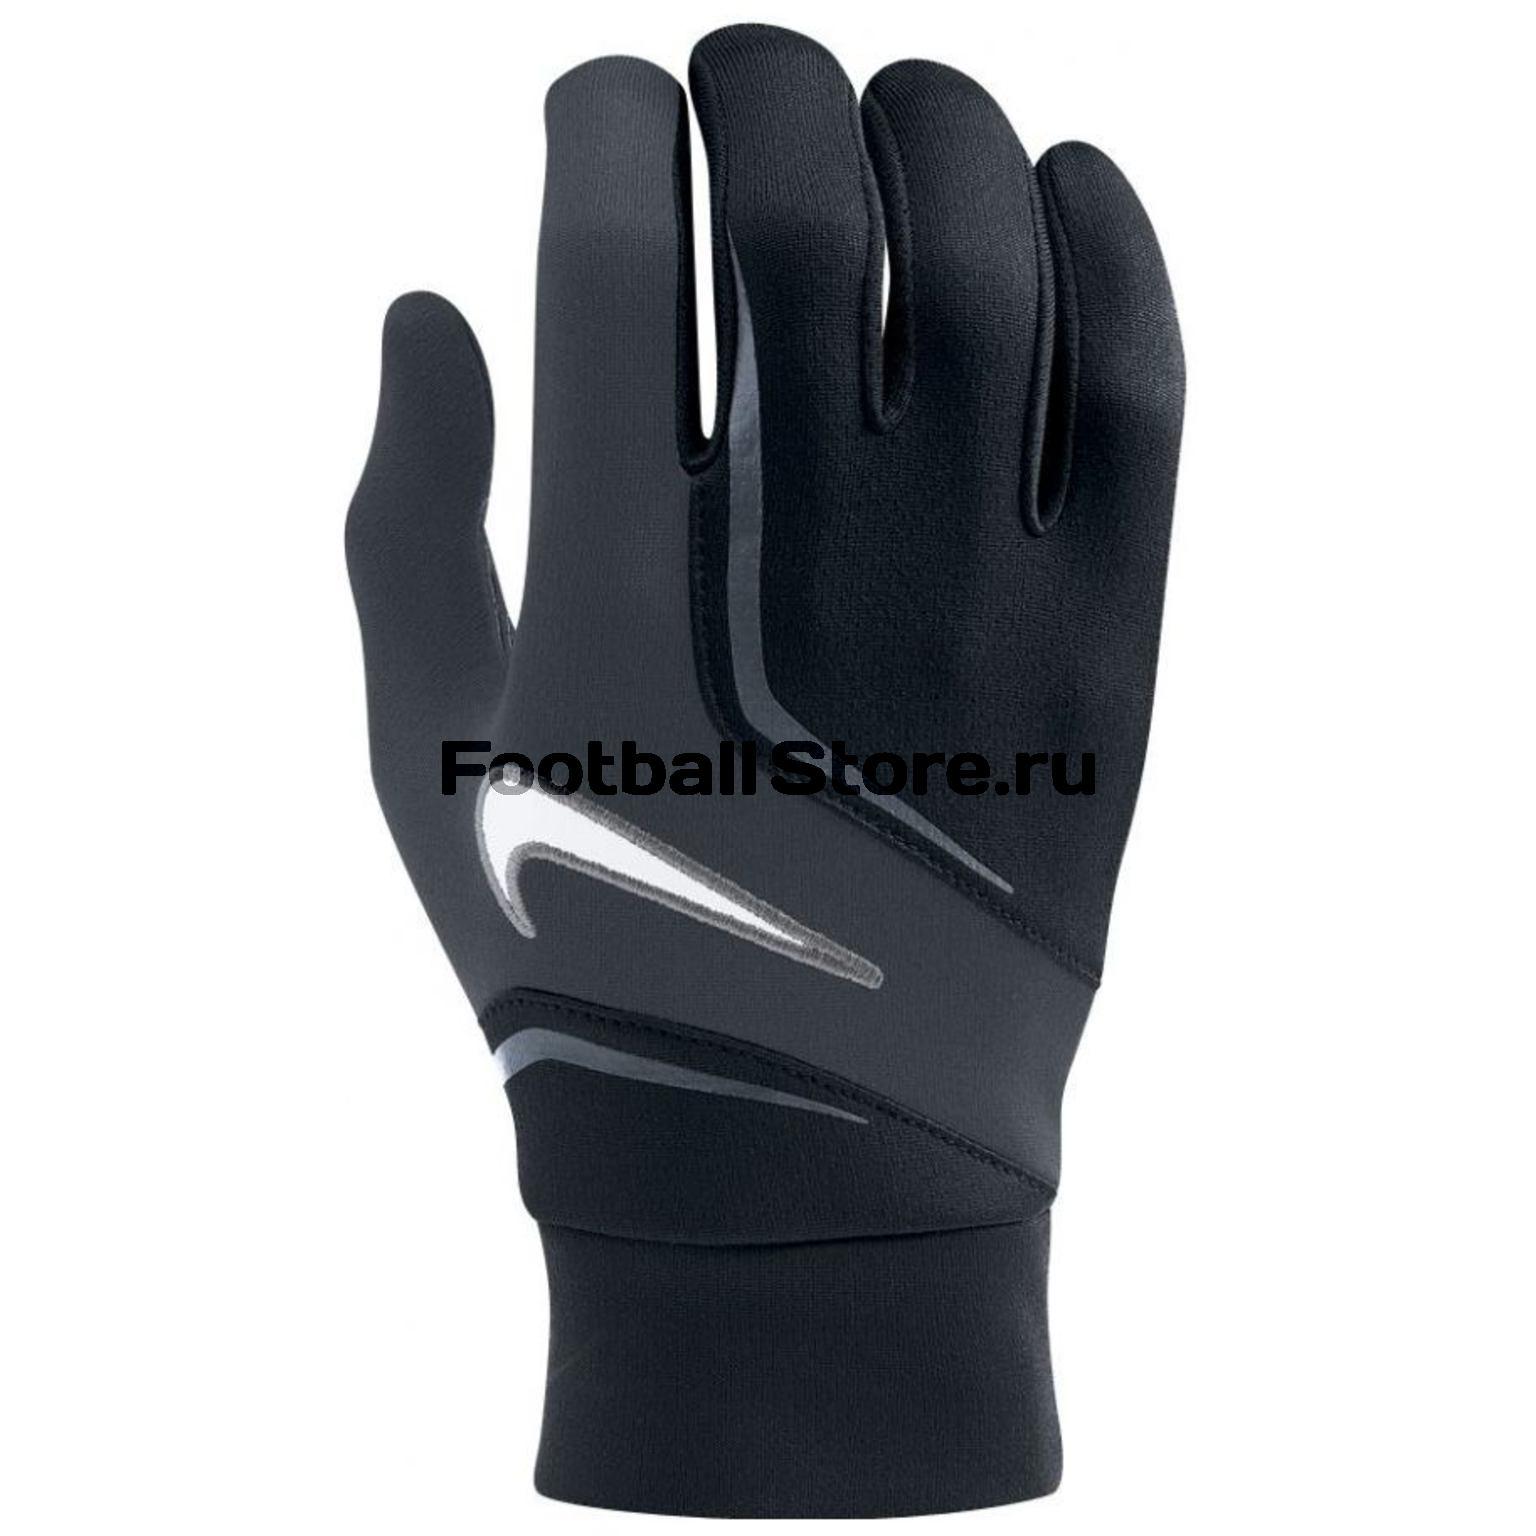 Перчатки Nike Перчатки трен. Nike ltwt field players gloves adlt